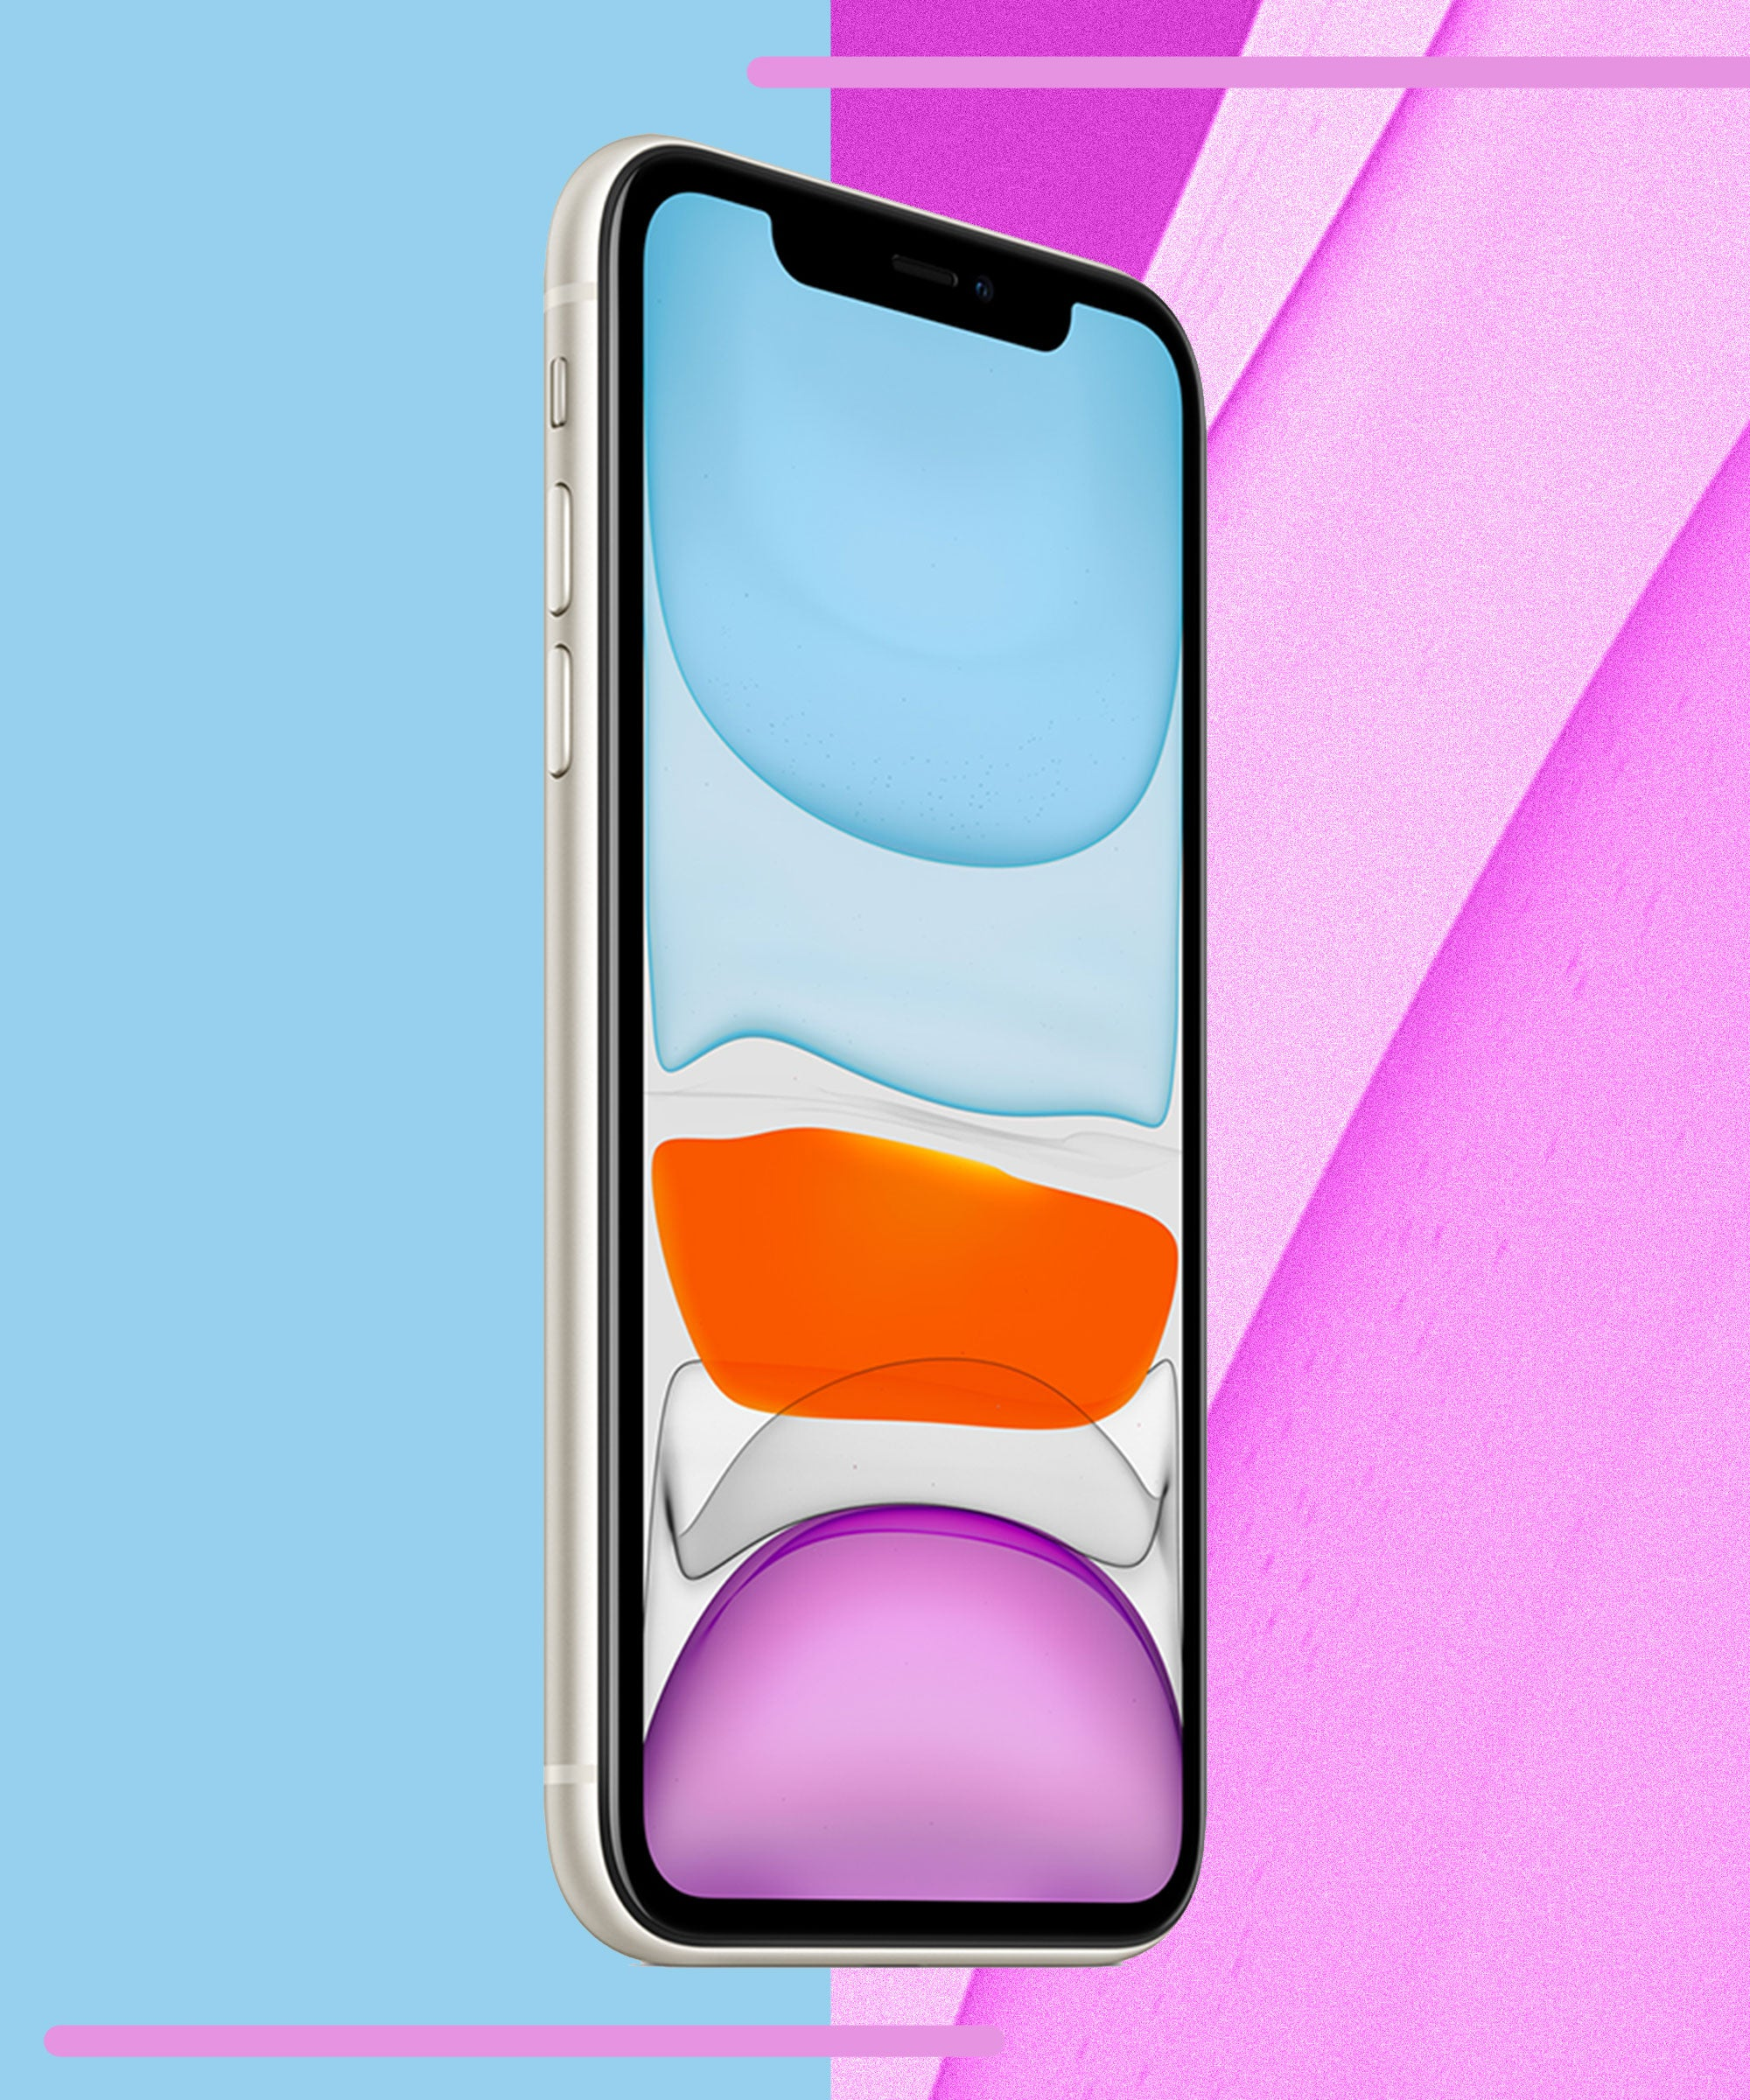 Apple iphone trade in program